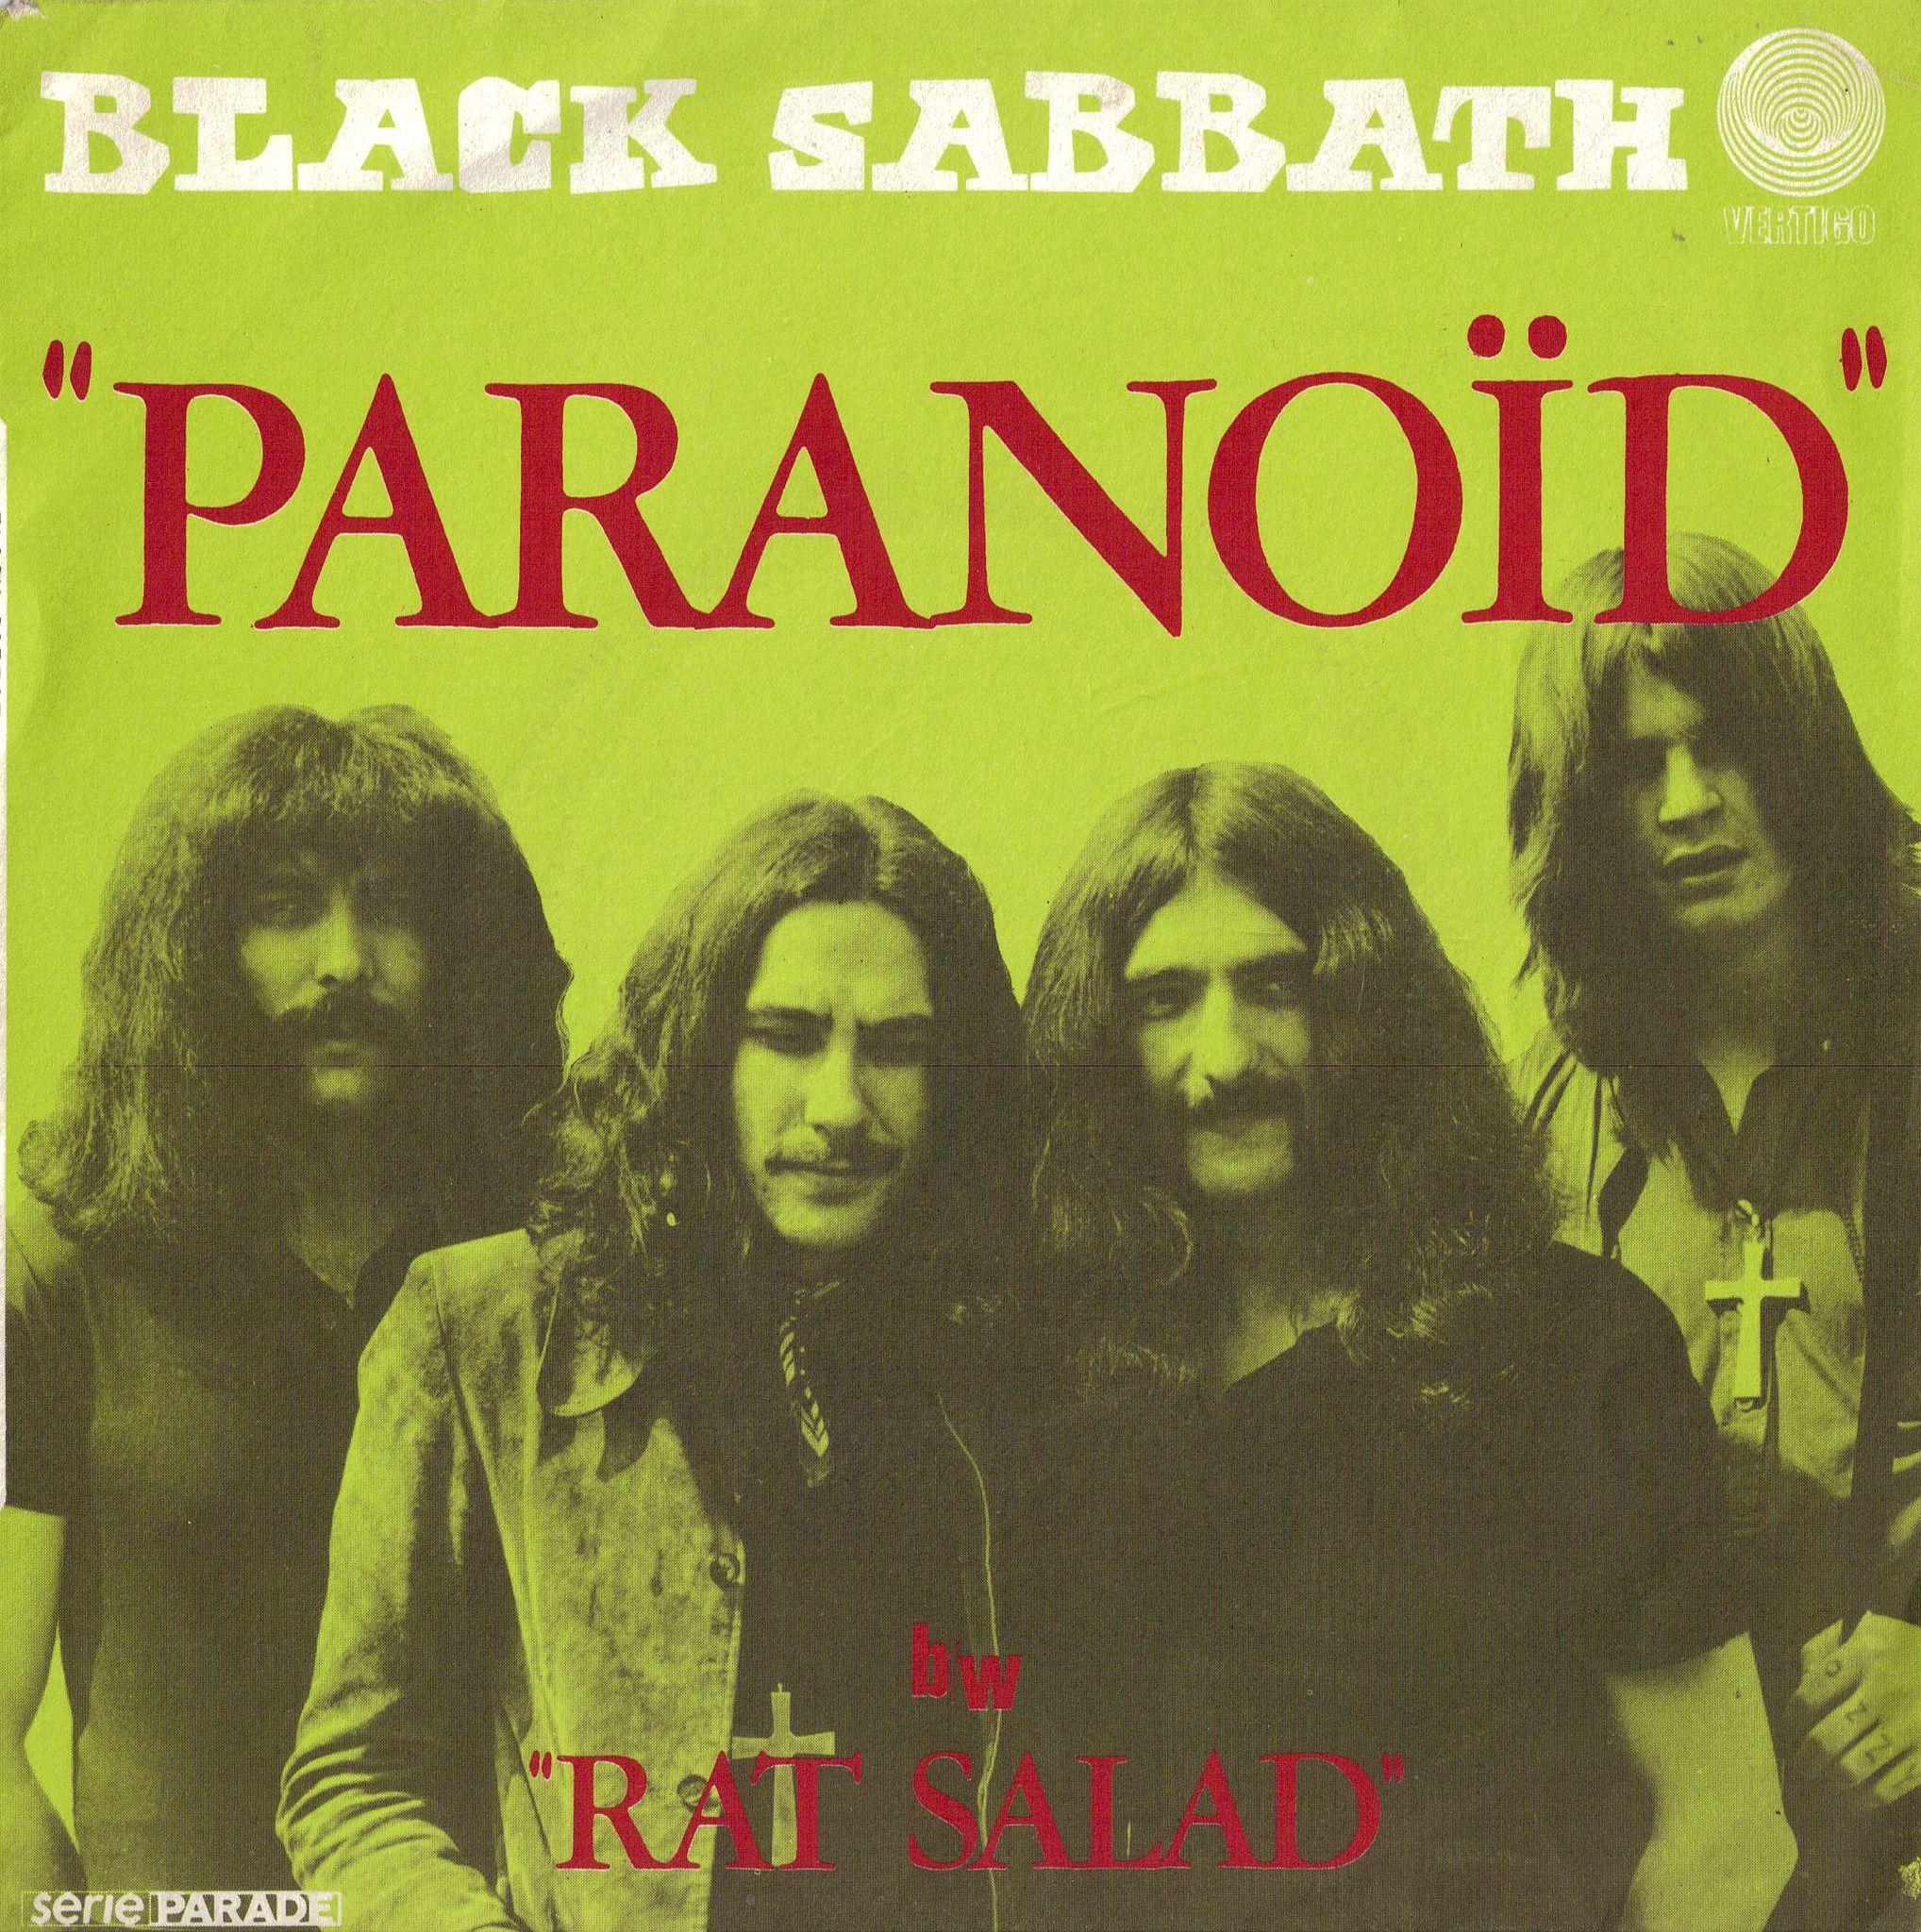 Black Sabbath Paranoid b/w Rat Salad | Black sabbath albums, Black sabbath,  Rock album covers